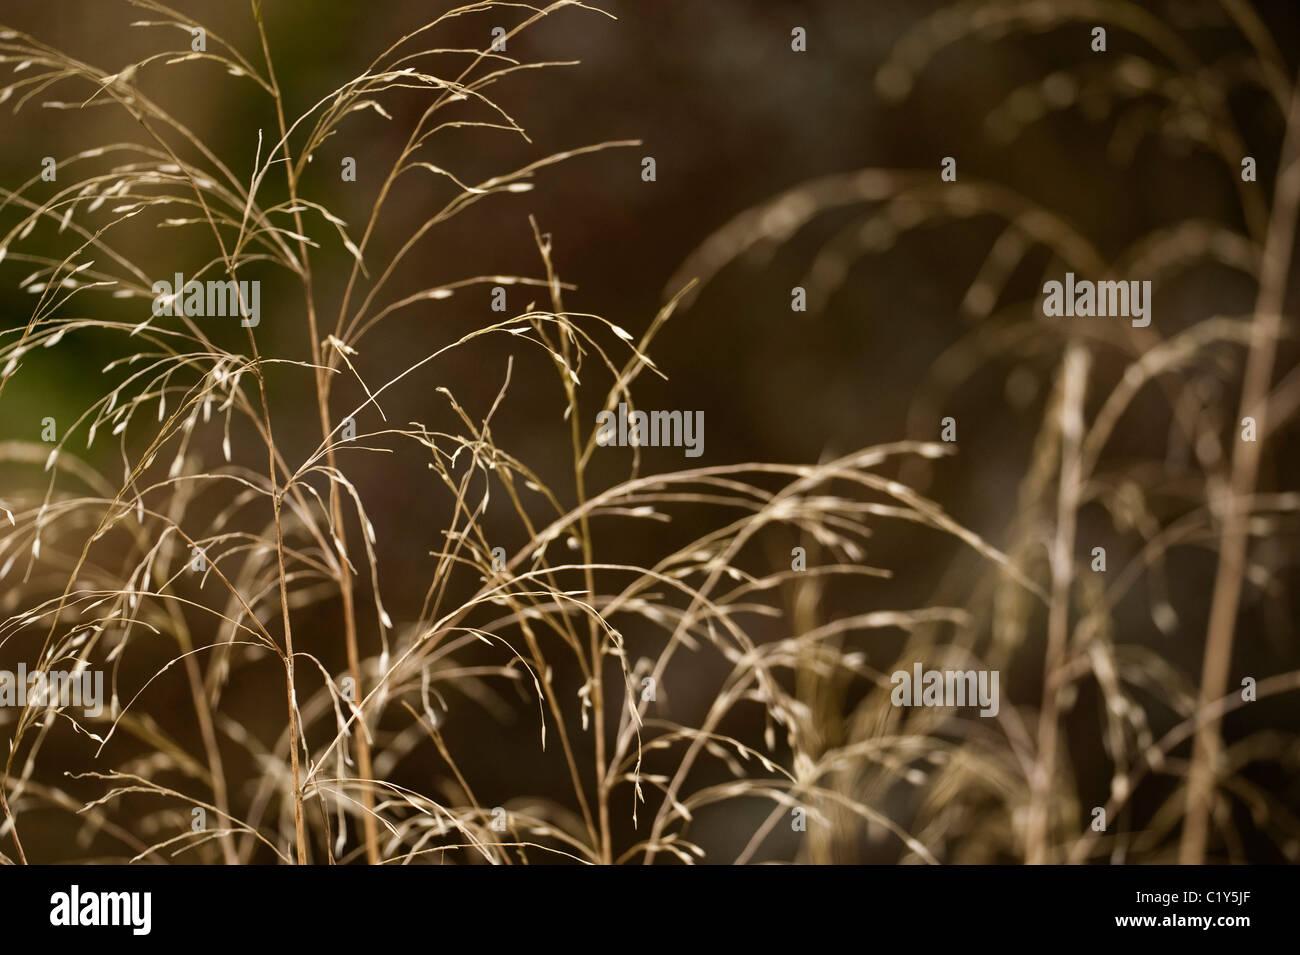 Chionochloa conspicua, Hunangemoho or Plumed Tussock Grass - Stock Image